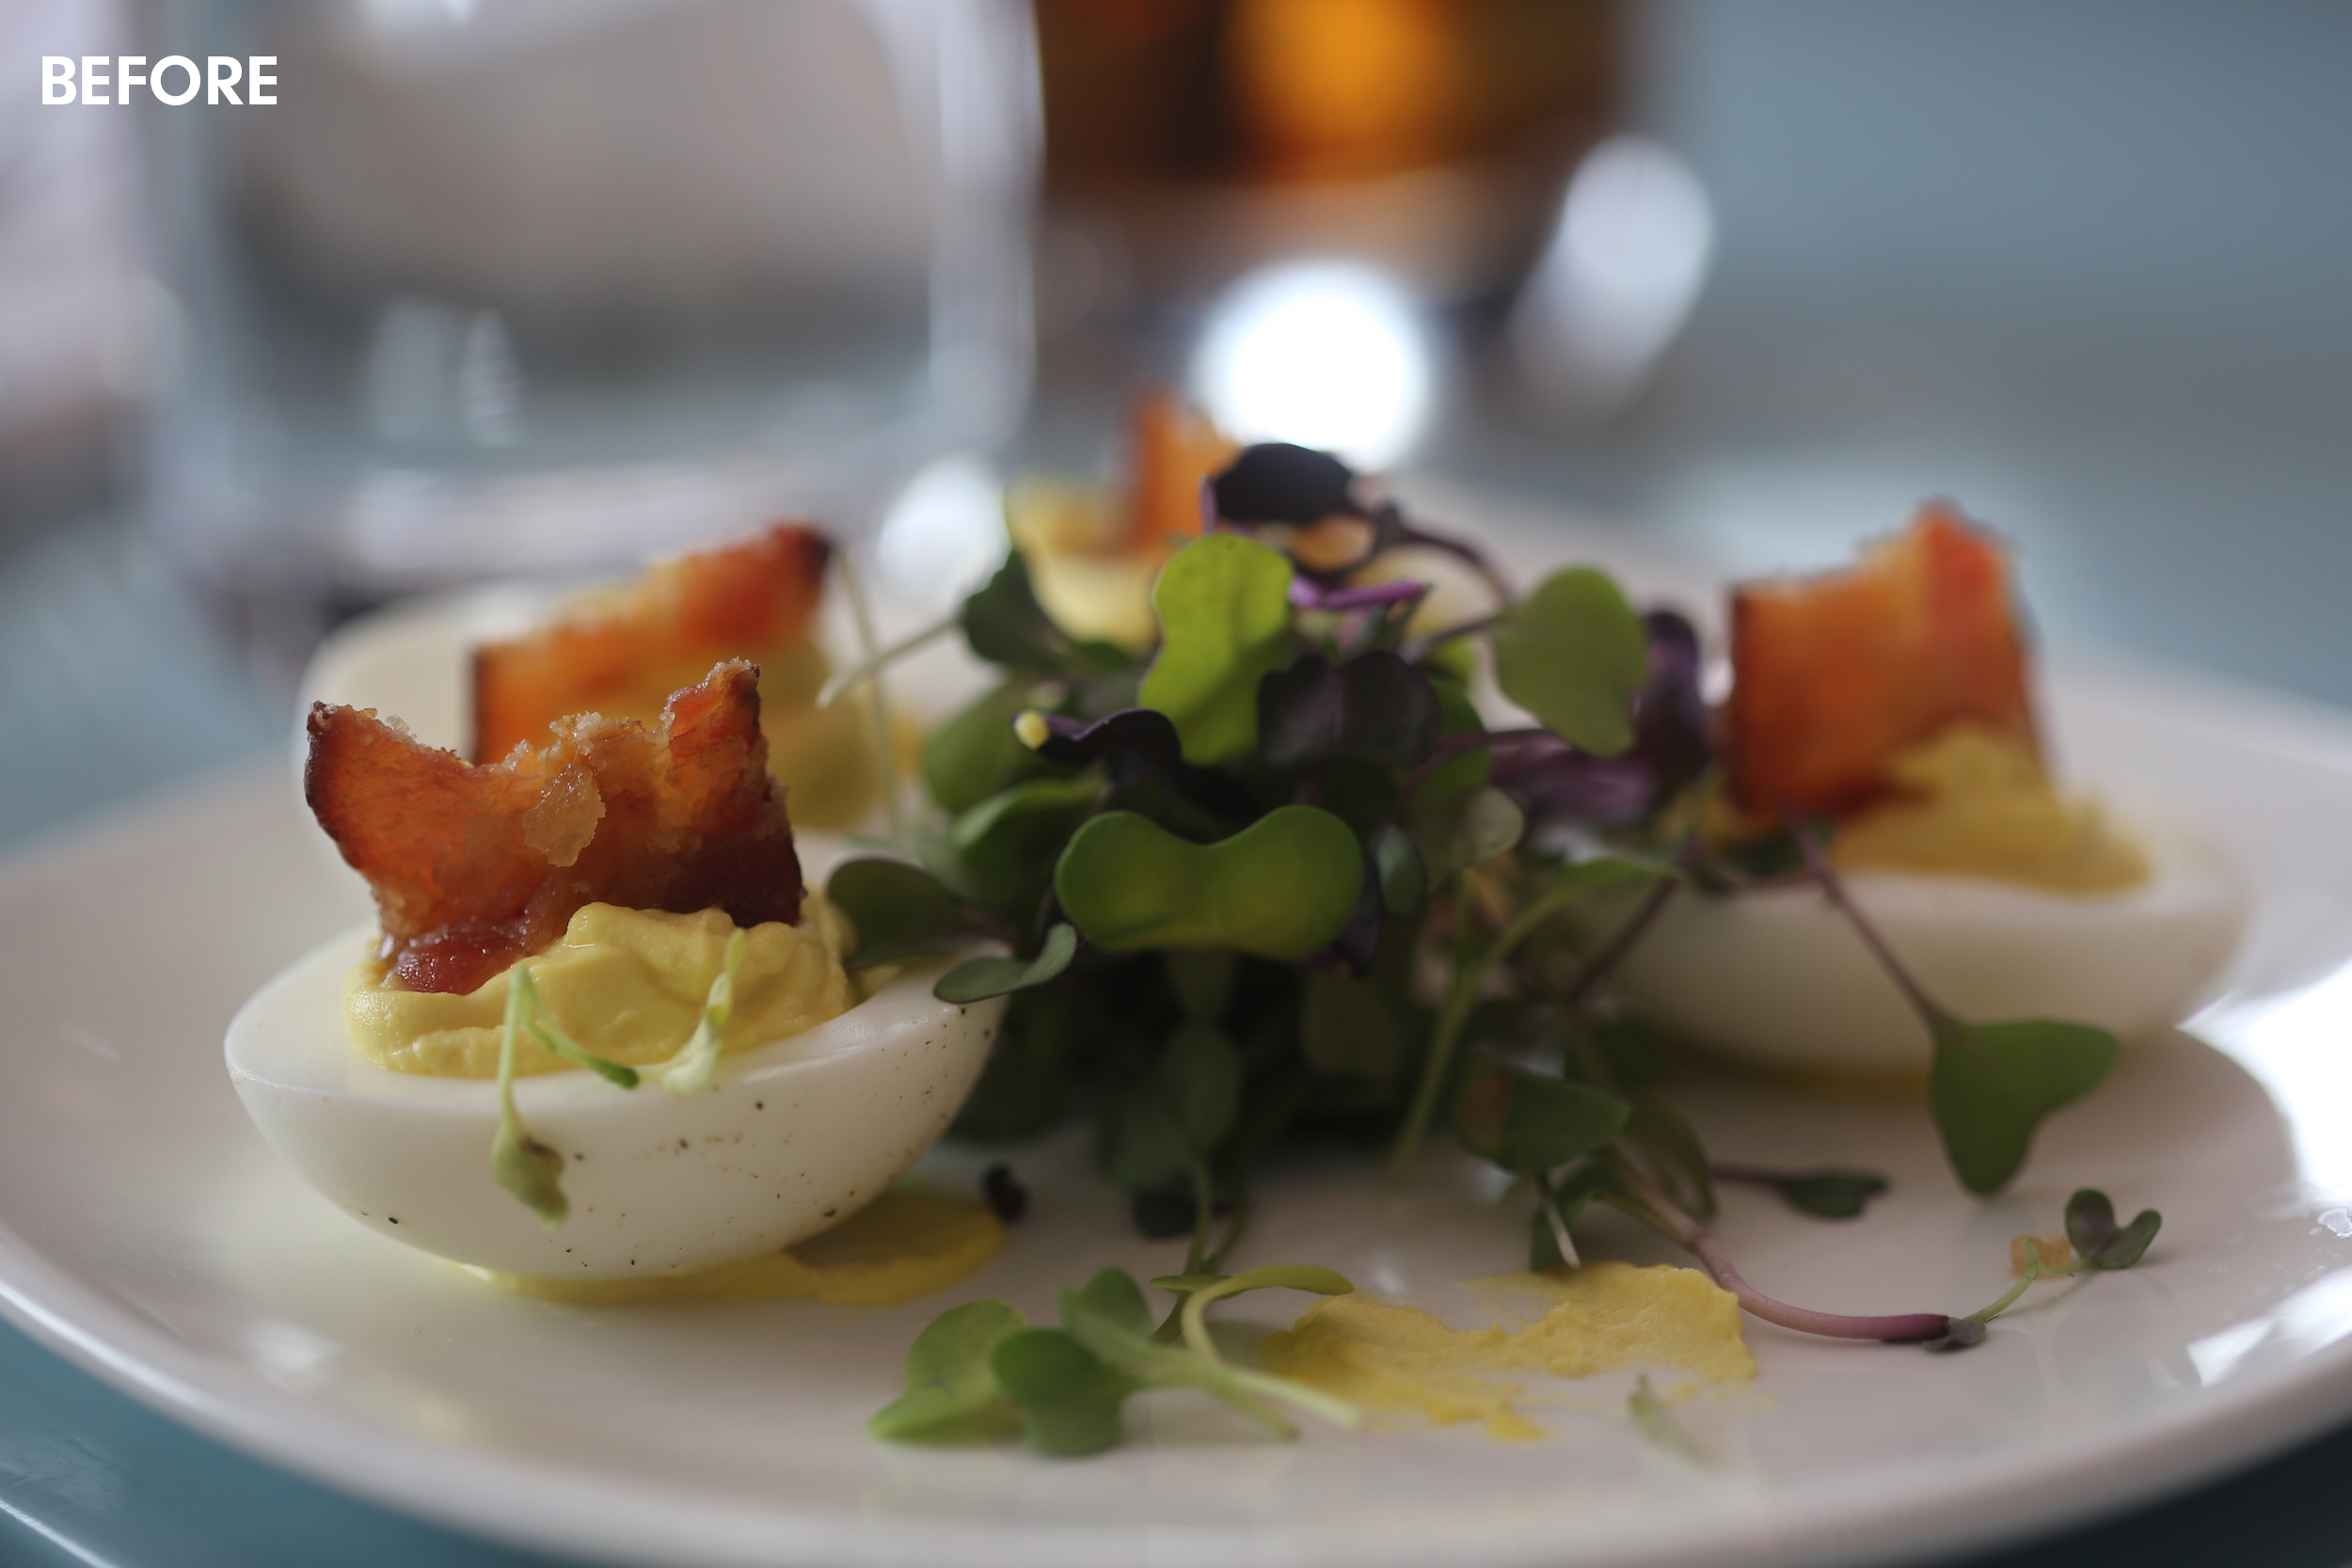 food-eggschickpeach-lightroom-presets4.jpg